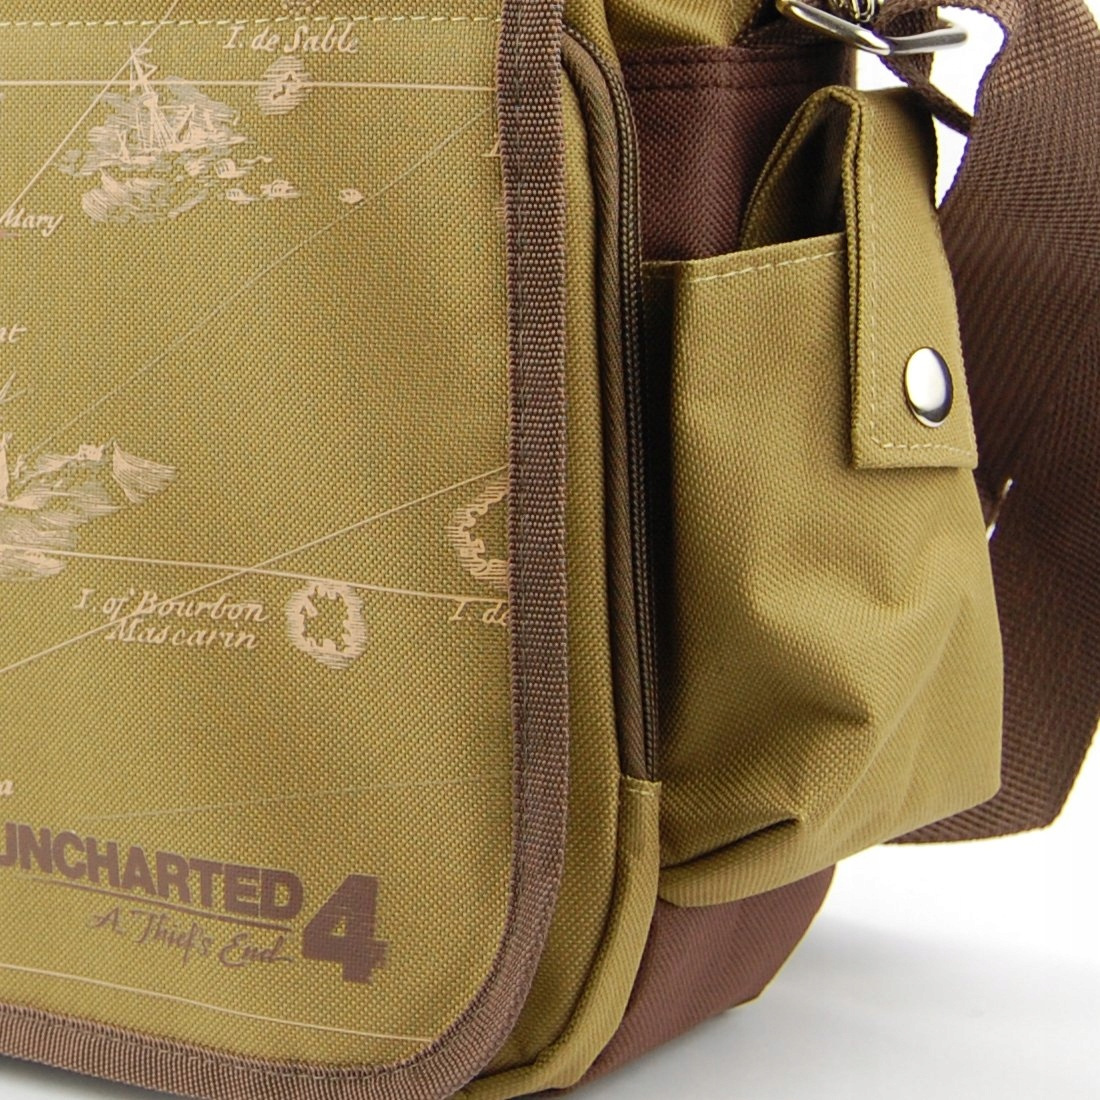 f2c2cbac24 TORBA MESSENGER BAG UNCHARTED 4 THIEF S END NOWA - 7219253834 ...